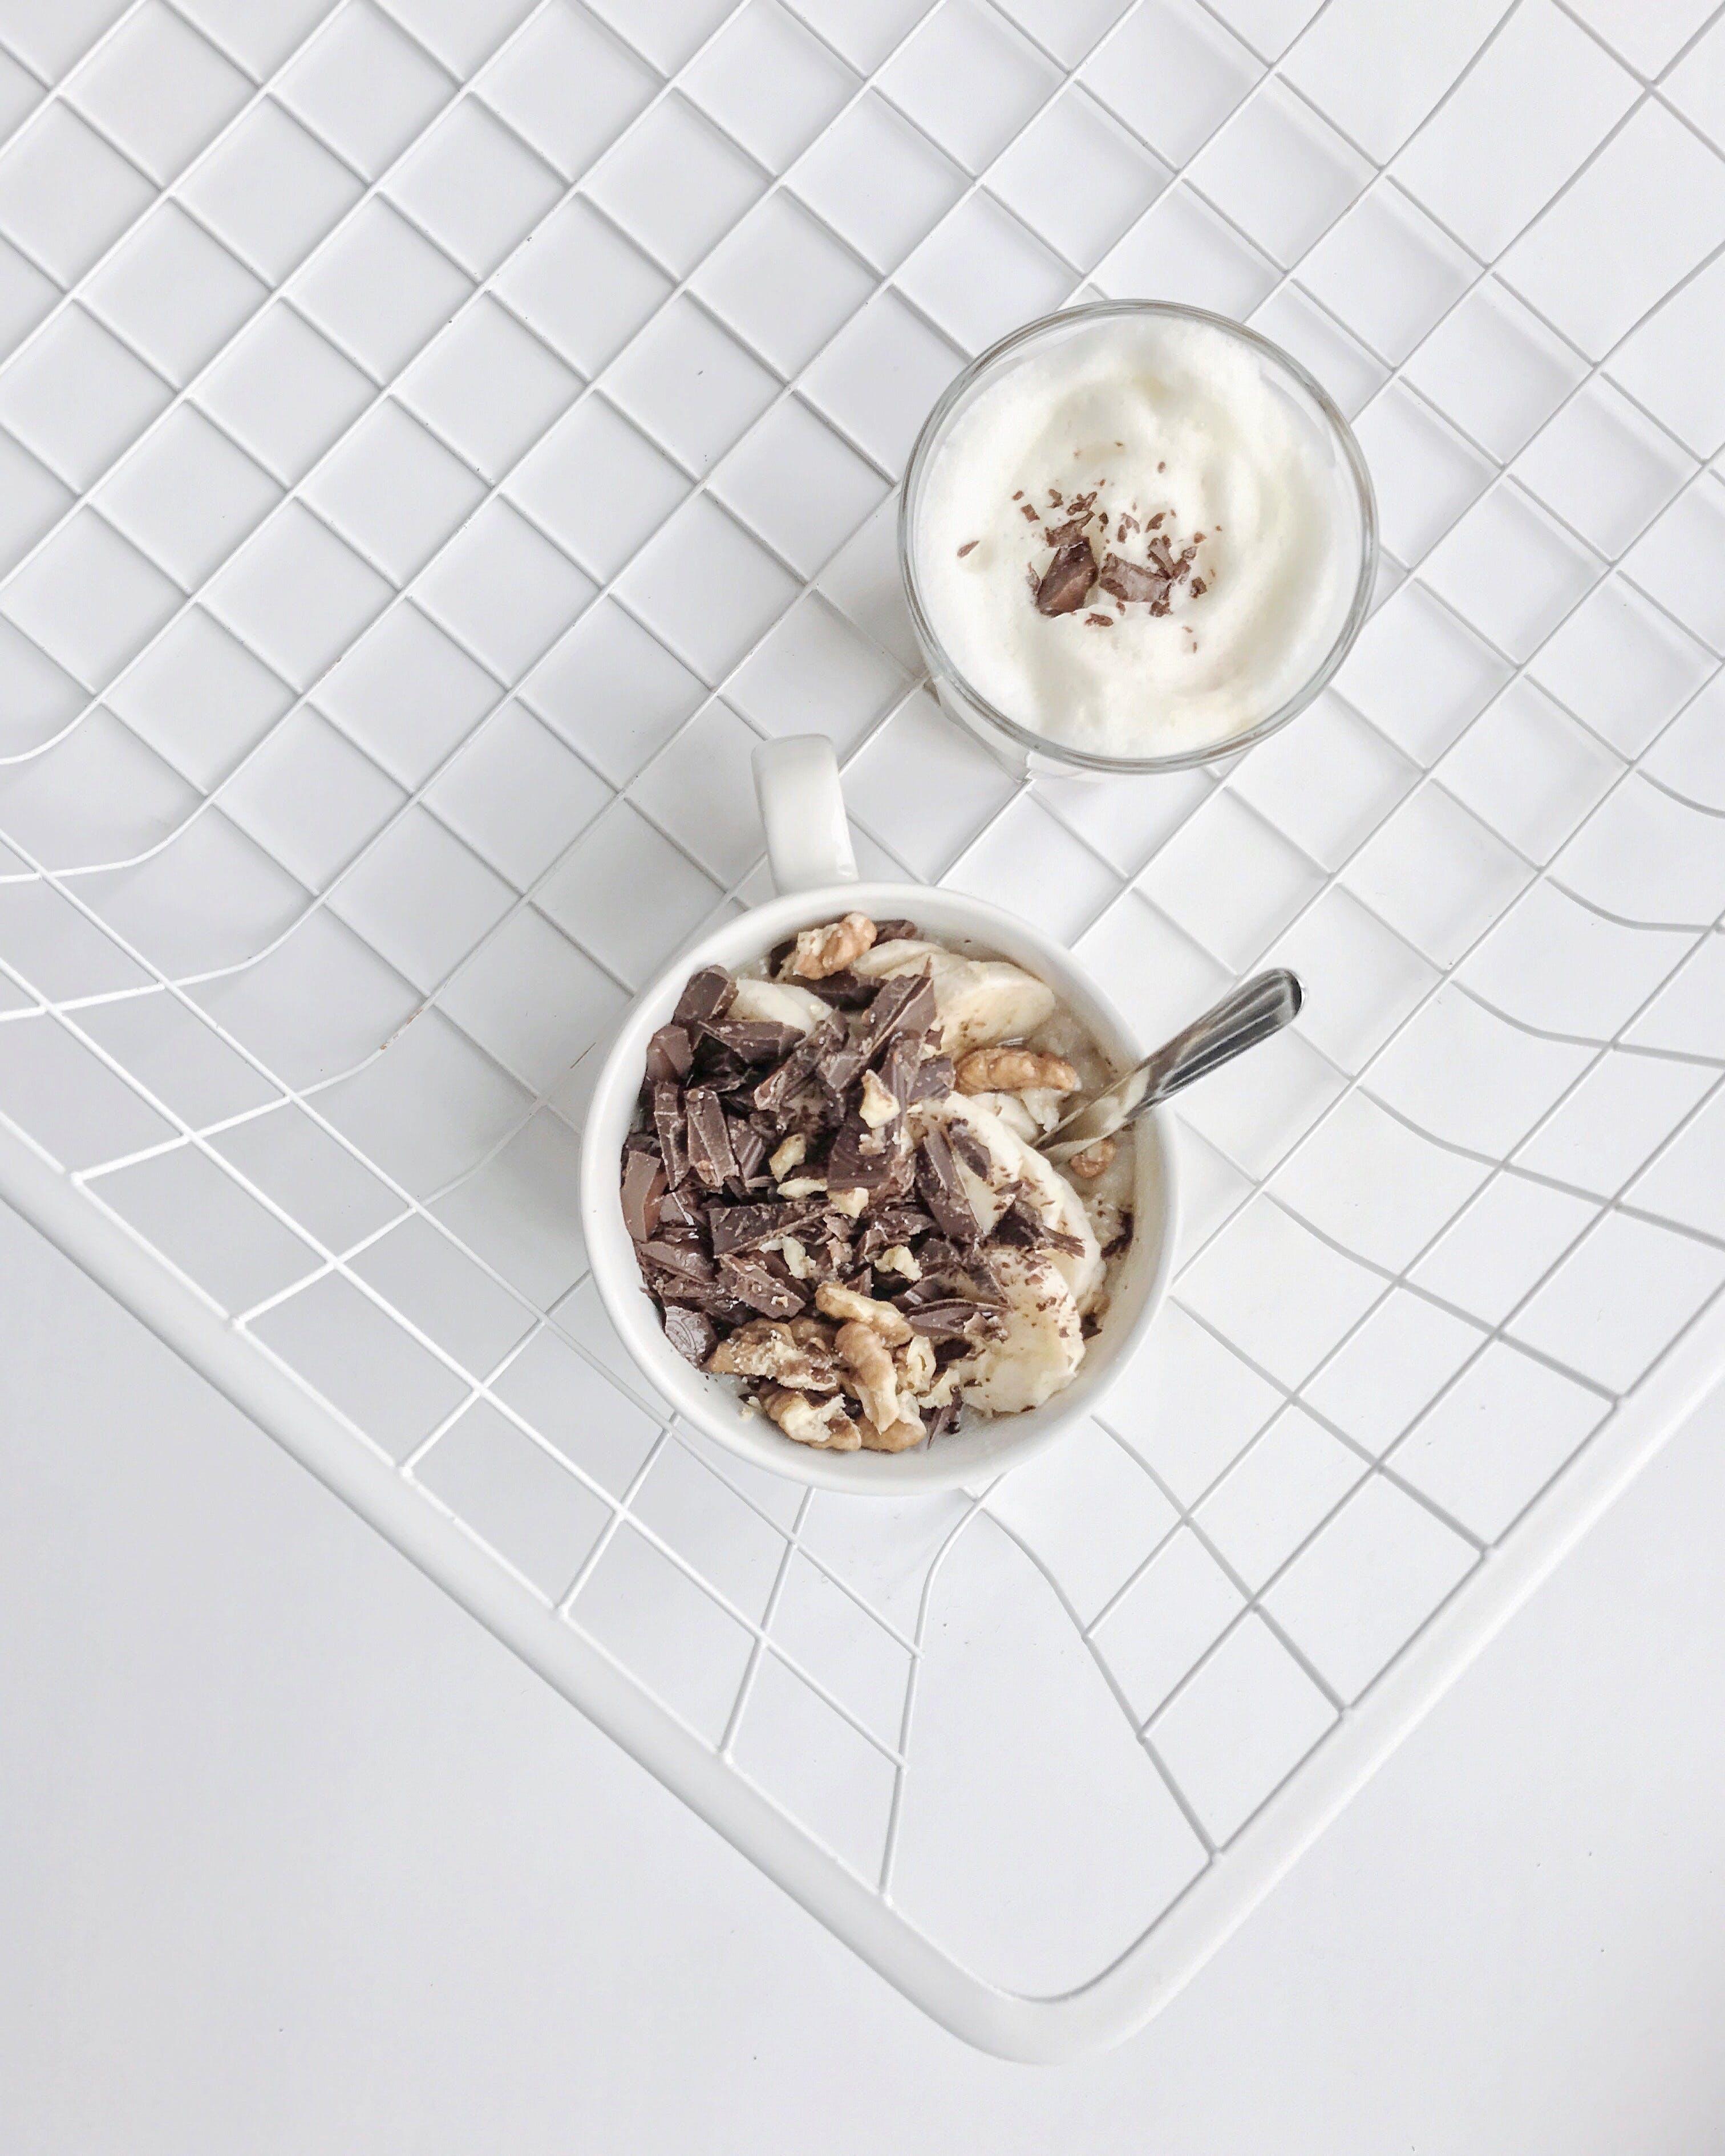 Crushed Nuts and Chocolates on White Ceramic Mug High-angle Photography